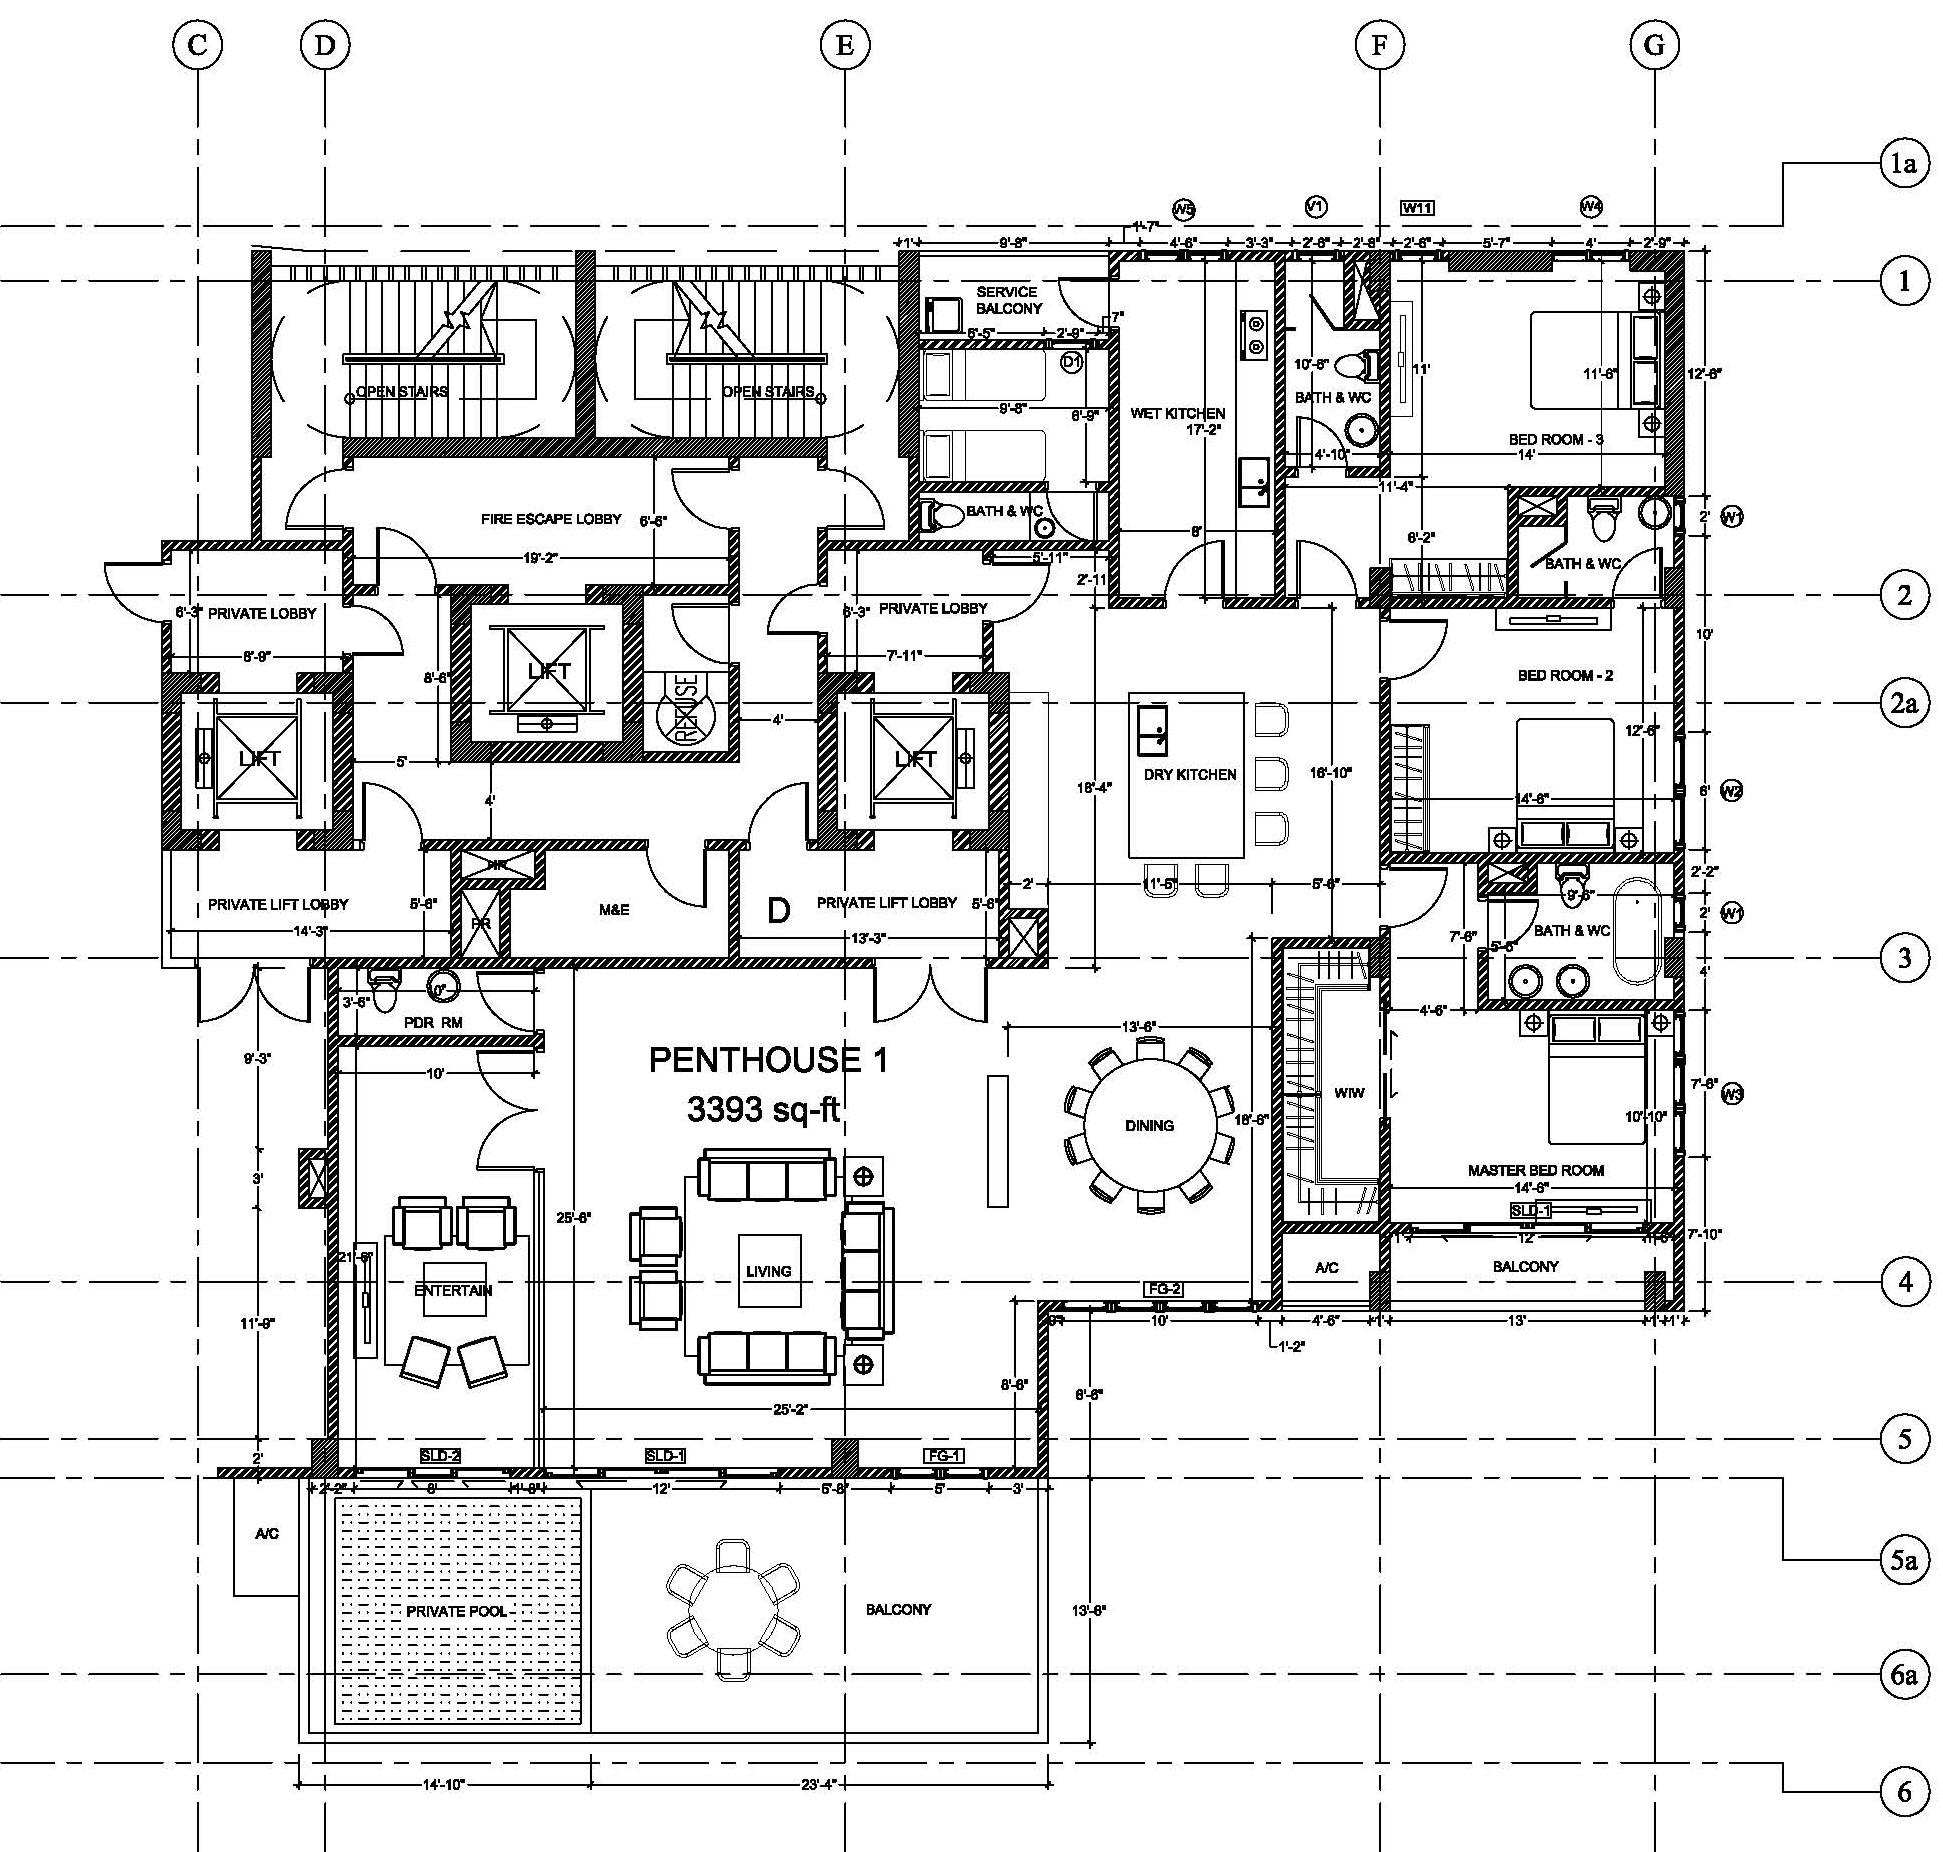 interior design with floor plan